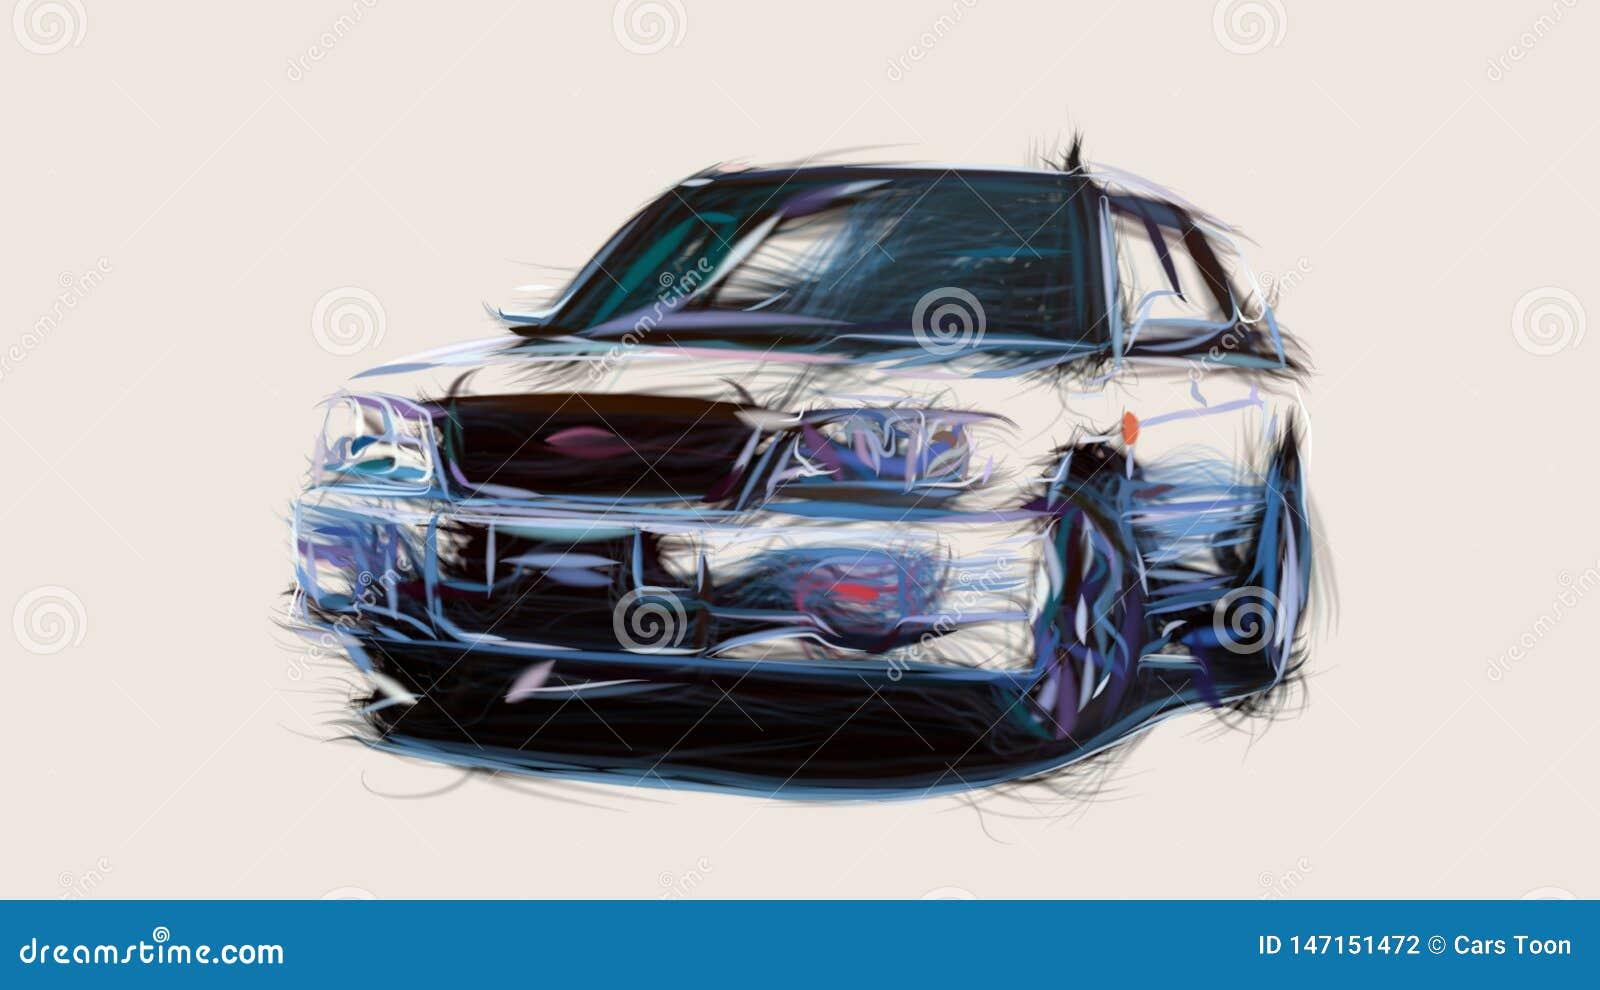 2000 Subaru Forester Sti Ii Id 2813 Stock Illustration